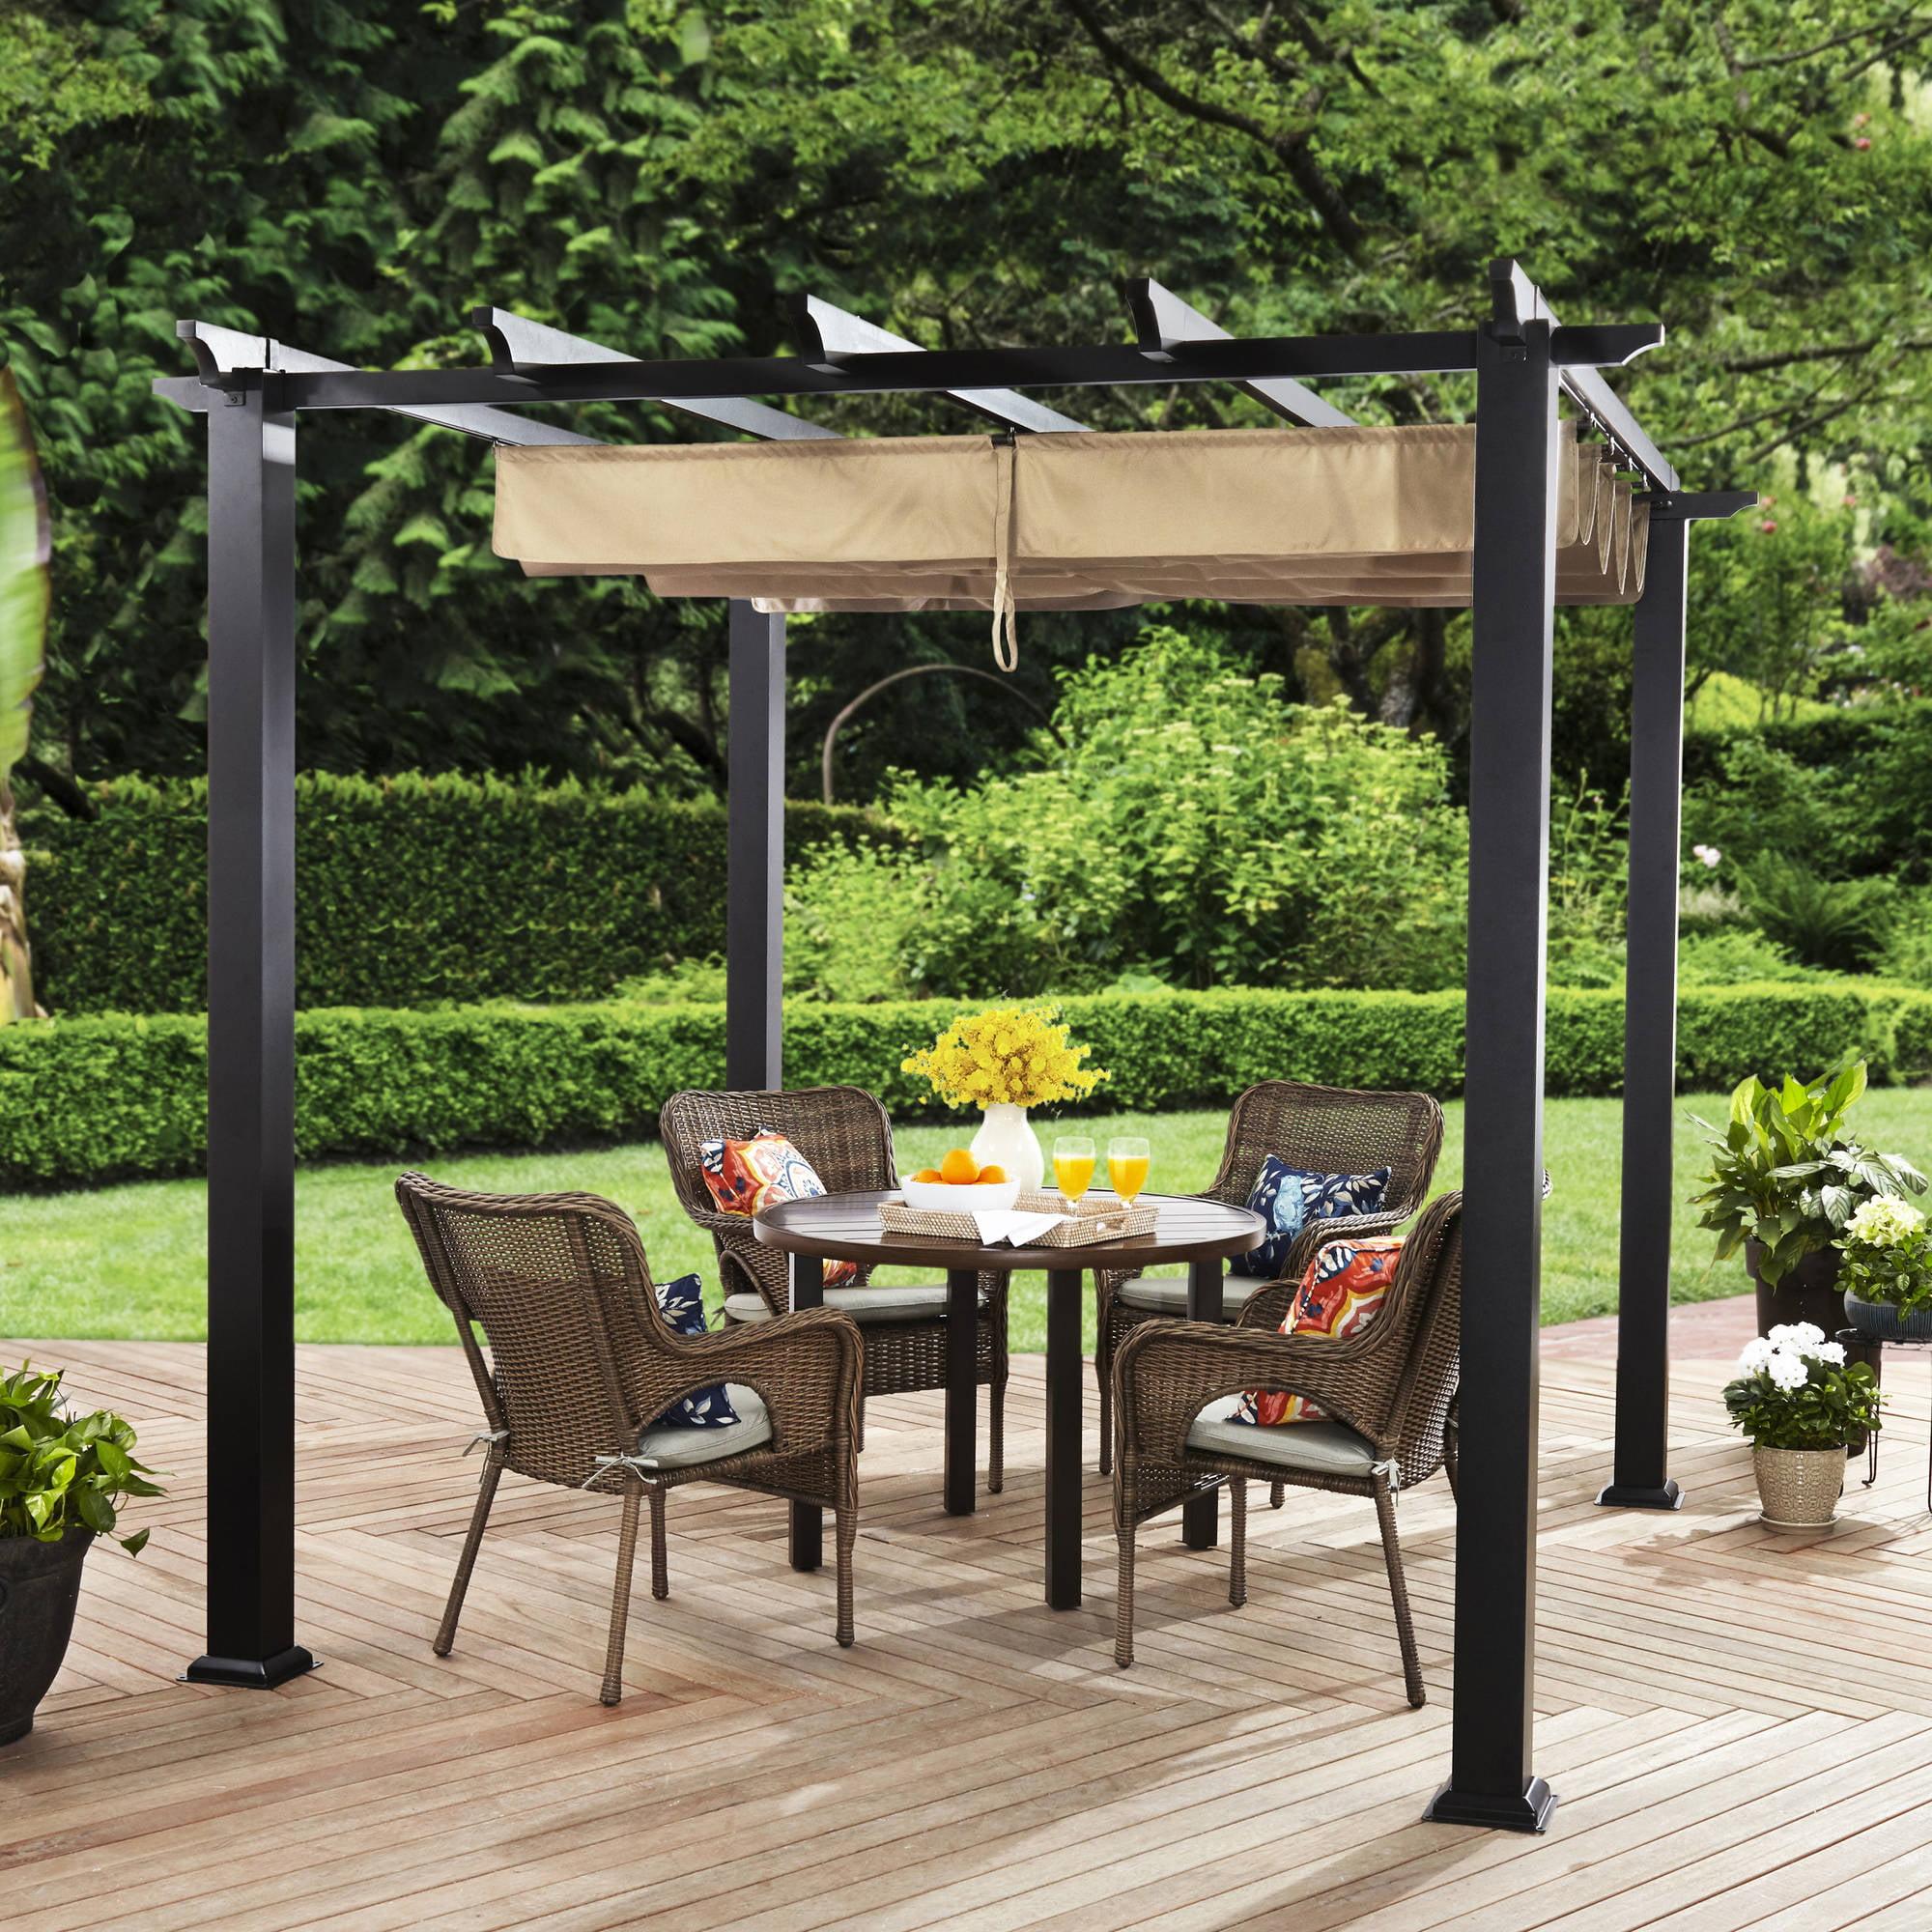 Better Homes And Gardens Meritmoor Aluminum Steel Pergola With